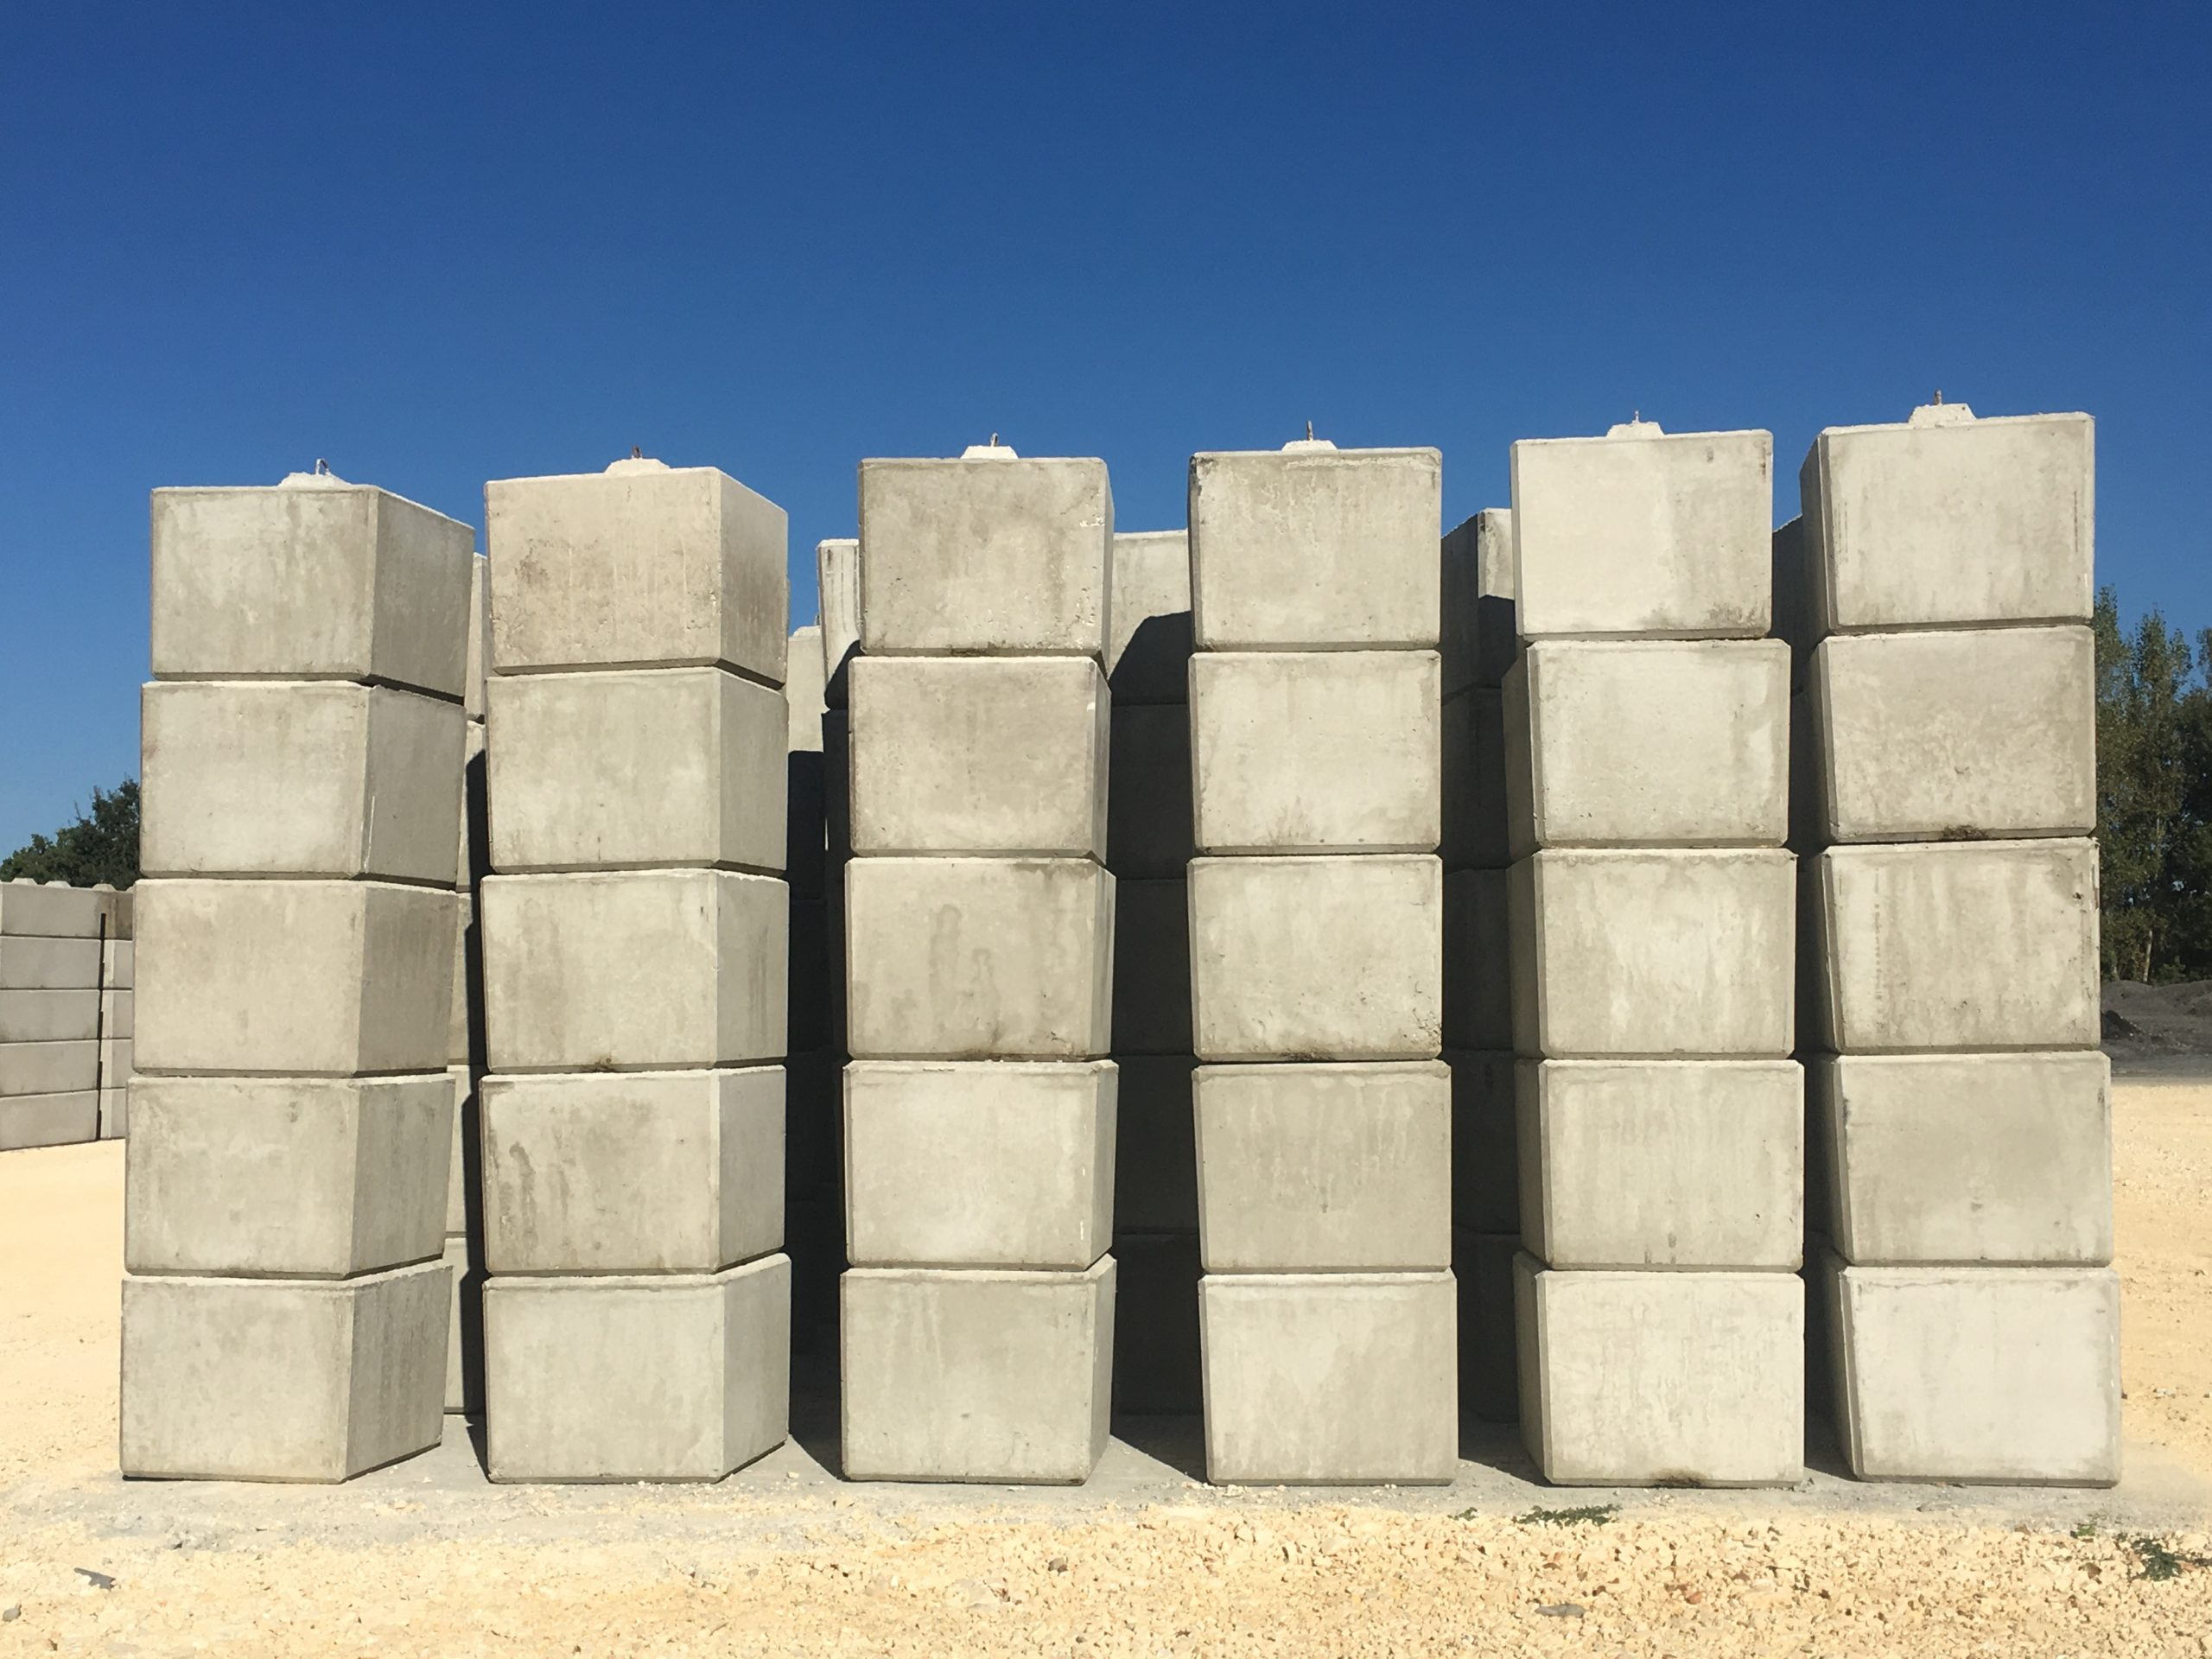 Vente blocs béton type Lego